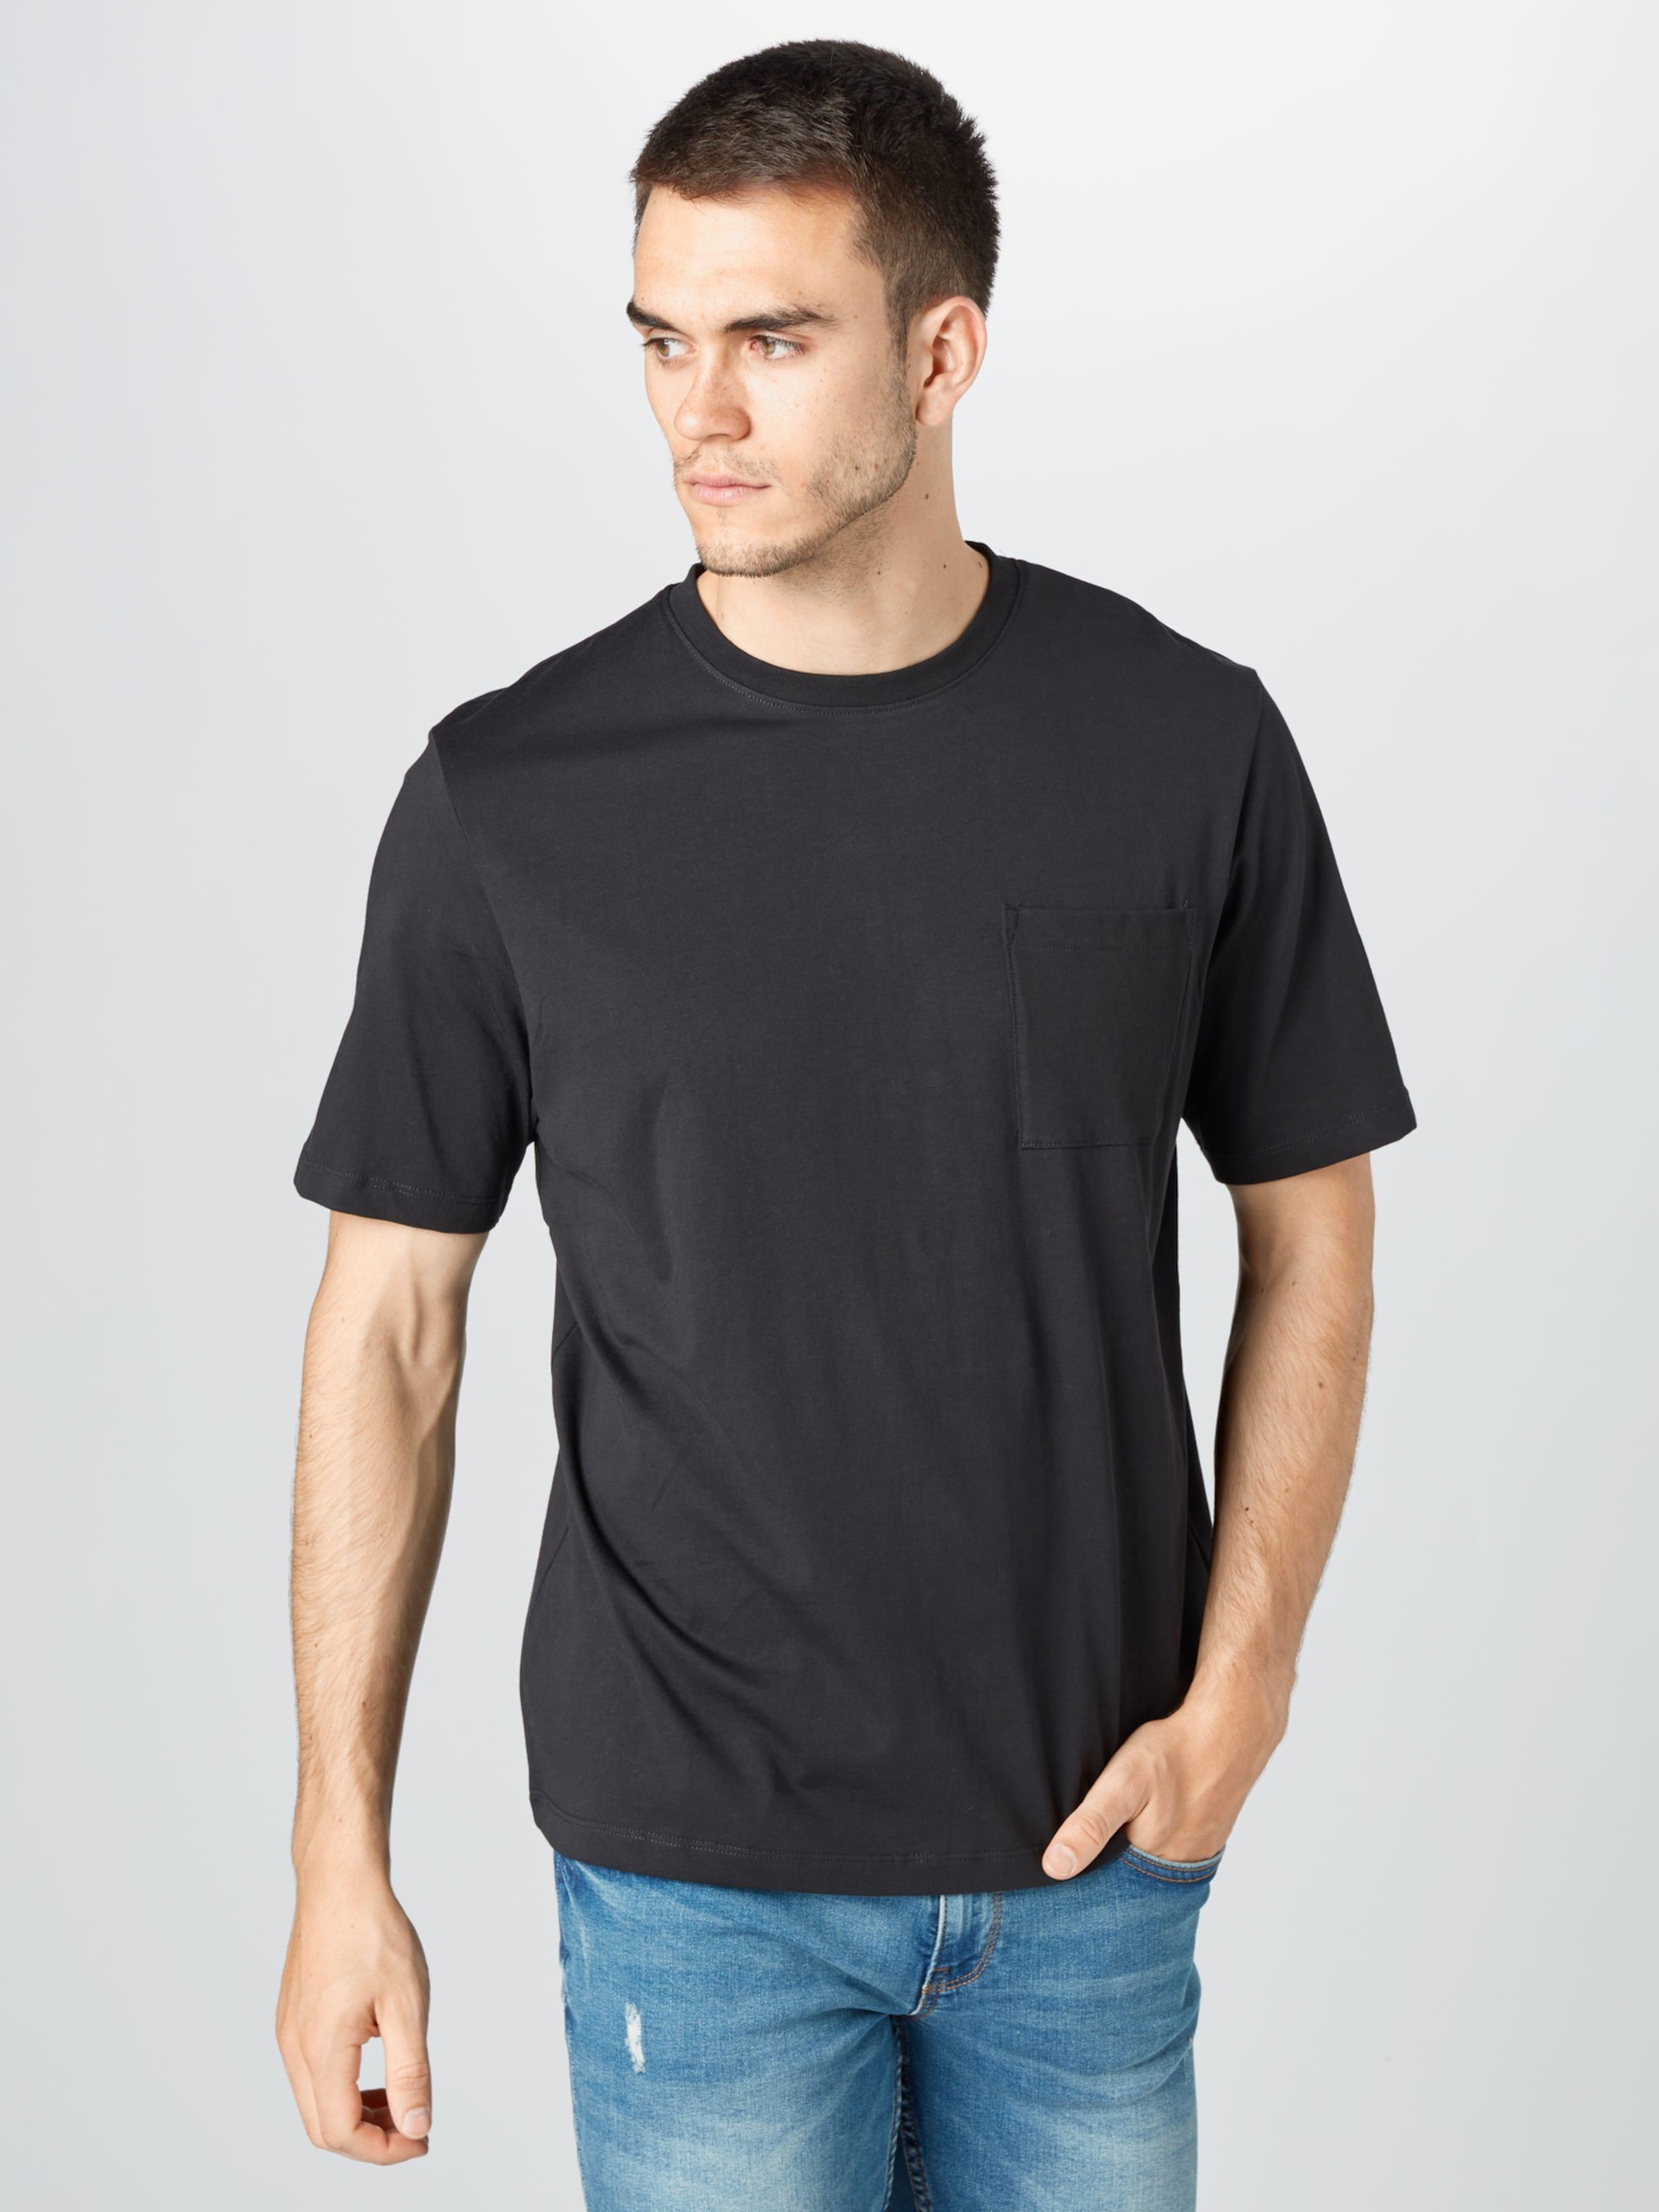 EDC BY ESPRIT T-Shirt in schwarz Jersey EDC2812001000001